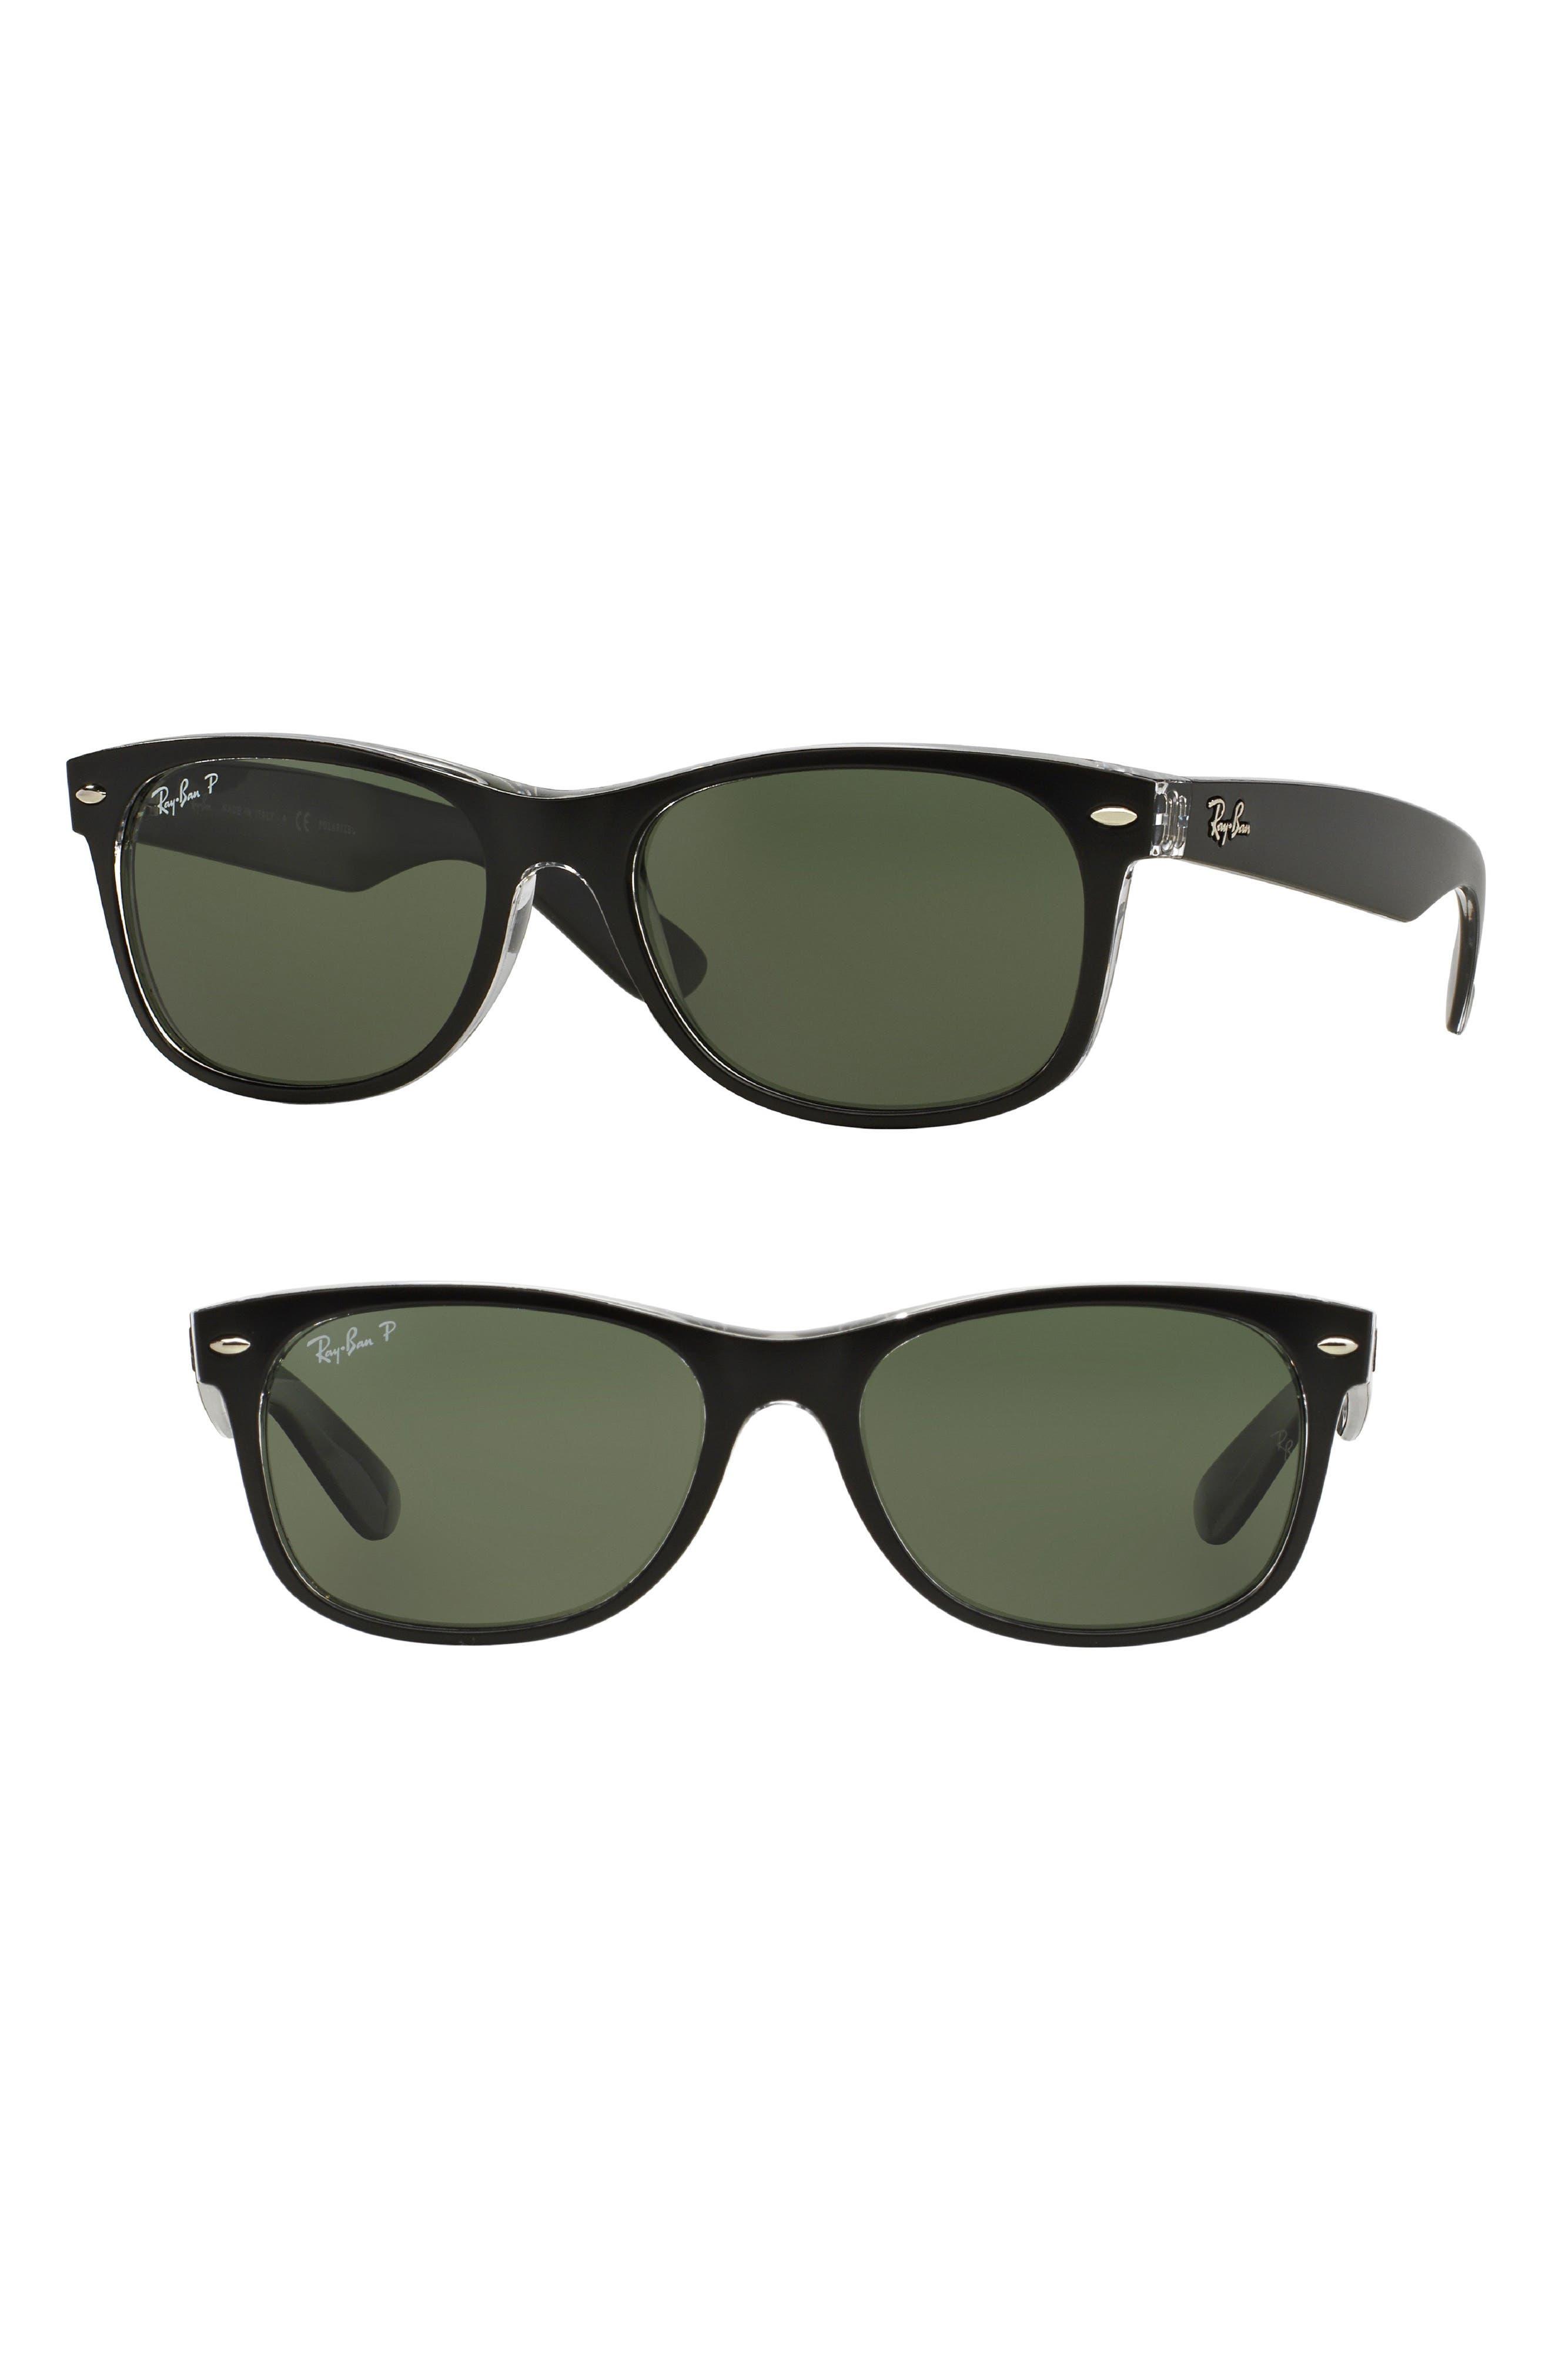 Standard New Wayfarer 55mm Polarized Sunglasses,                             Main thumbnail 1, color,                             010